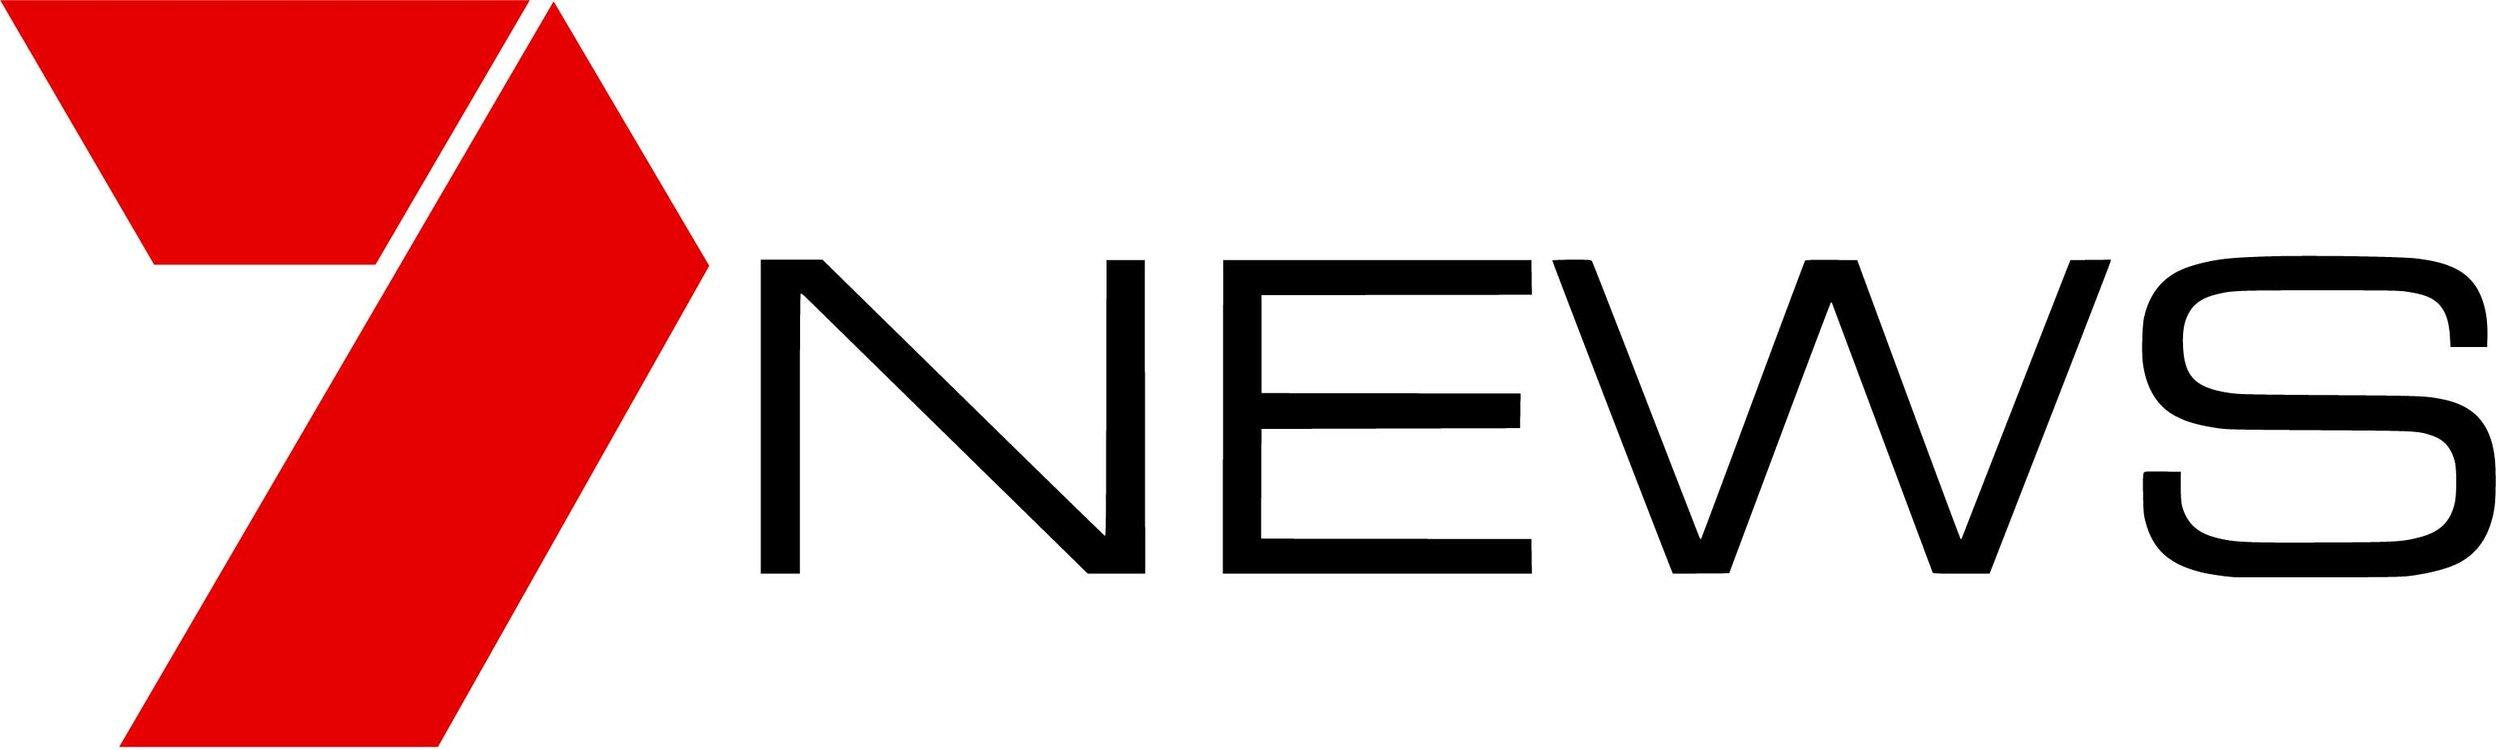 Seven_News1-1.jpg